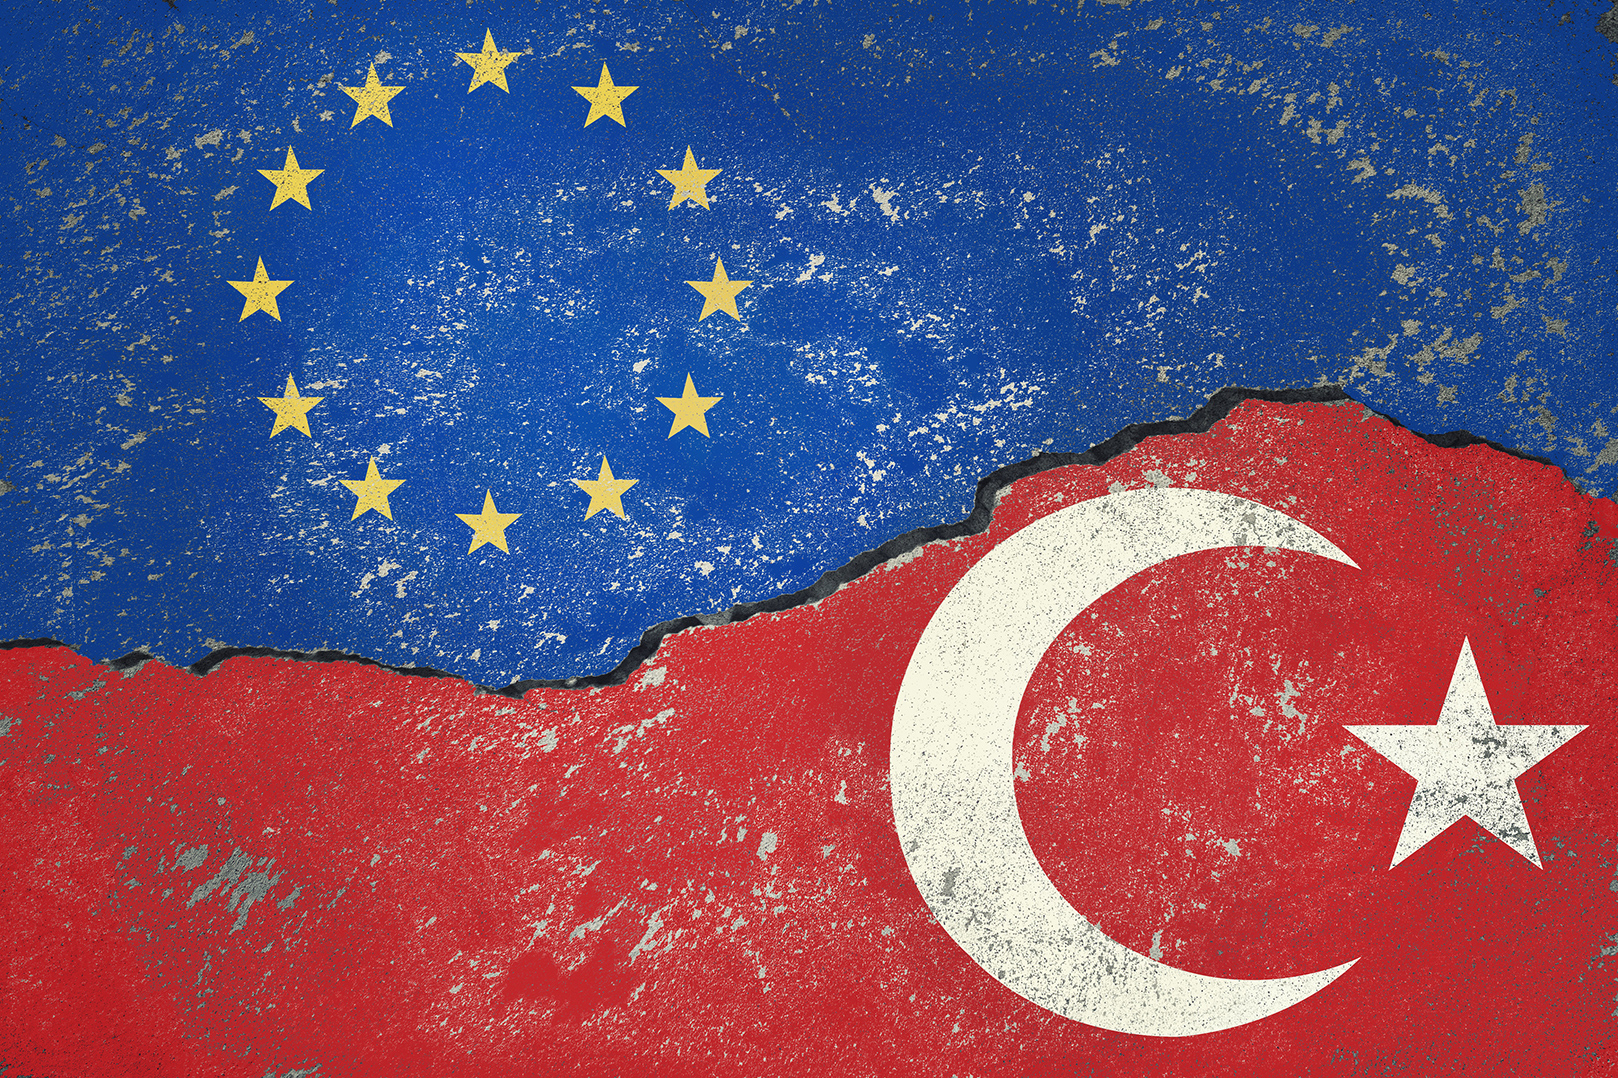 Türkei Eu Beitritt Referat